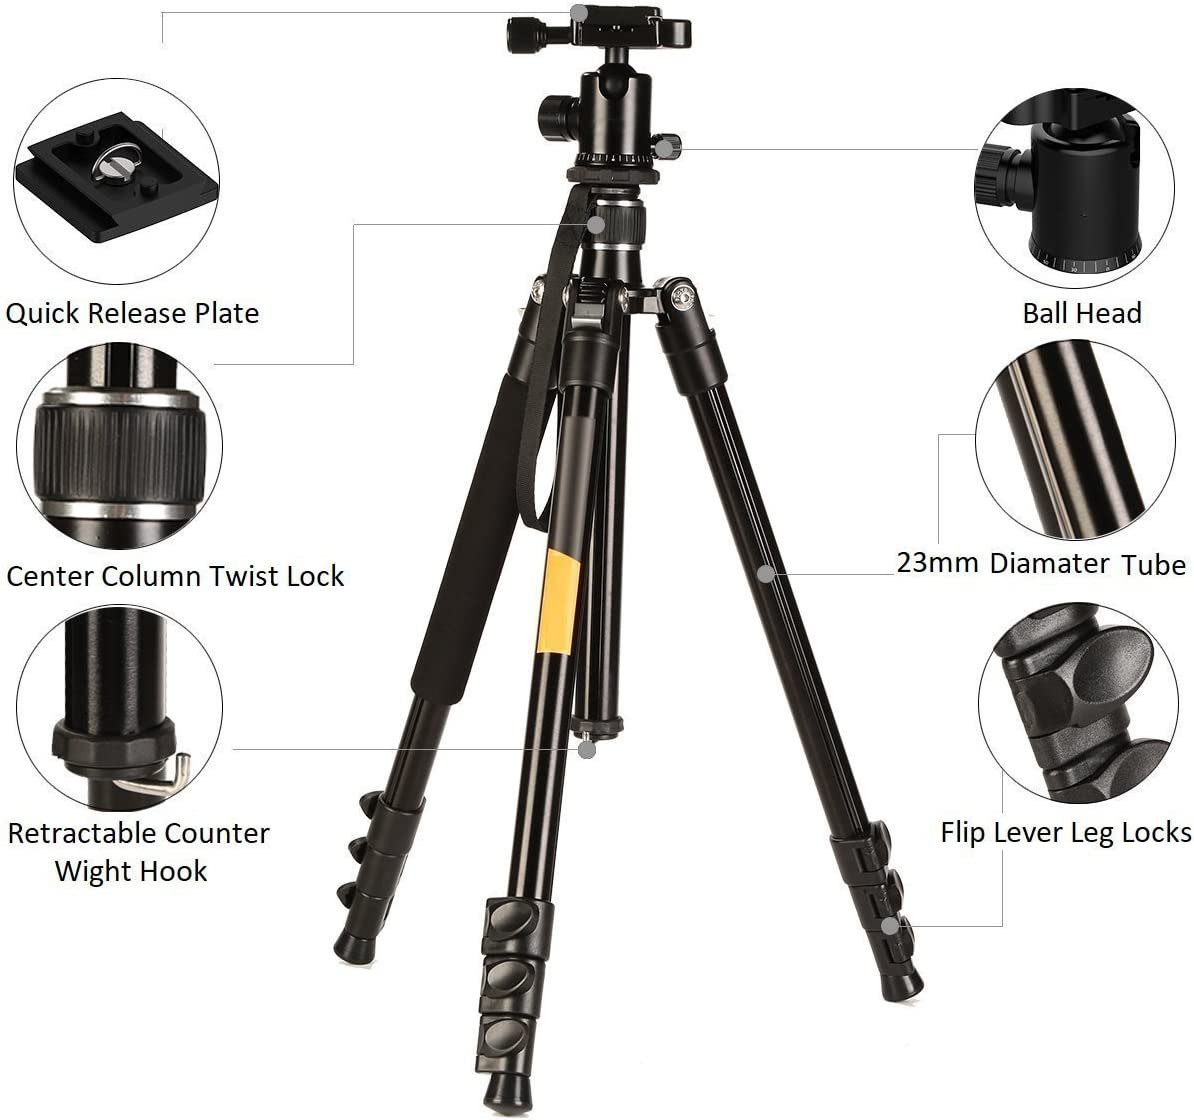 Blk//G 62 Travel Aluminum Alloy Tripod for Canon Nikon Sony Olympus Pentax DSLR Camera